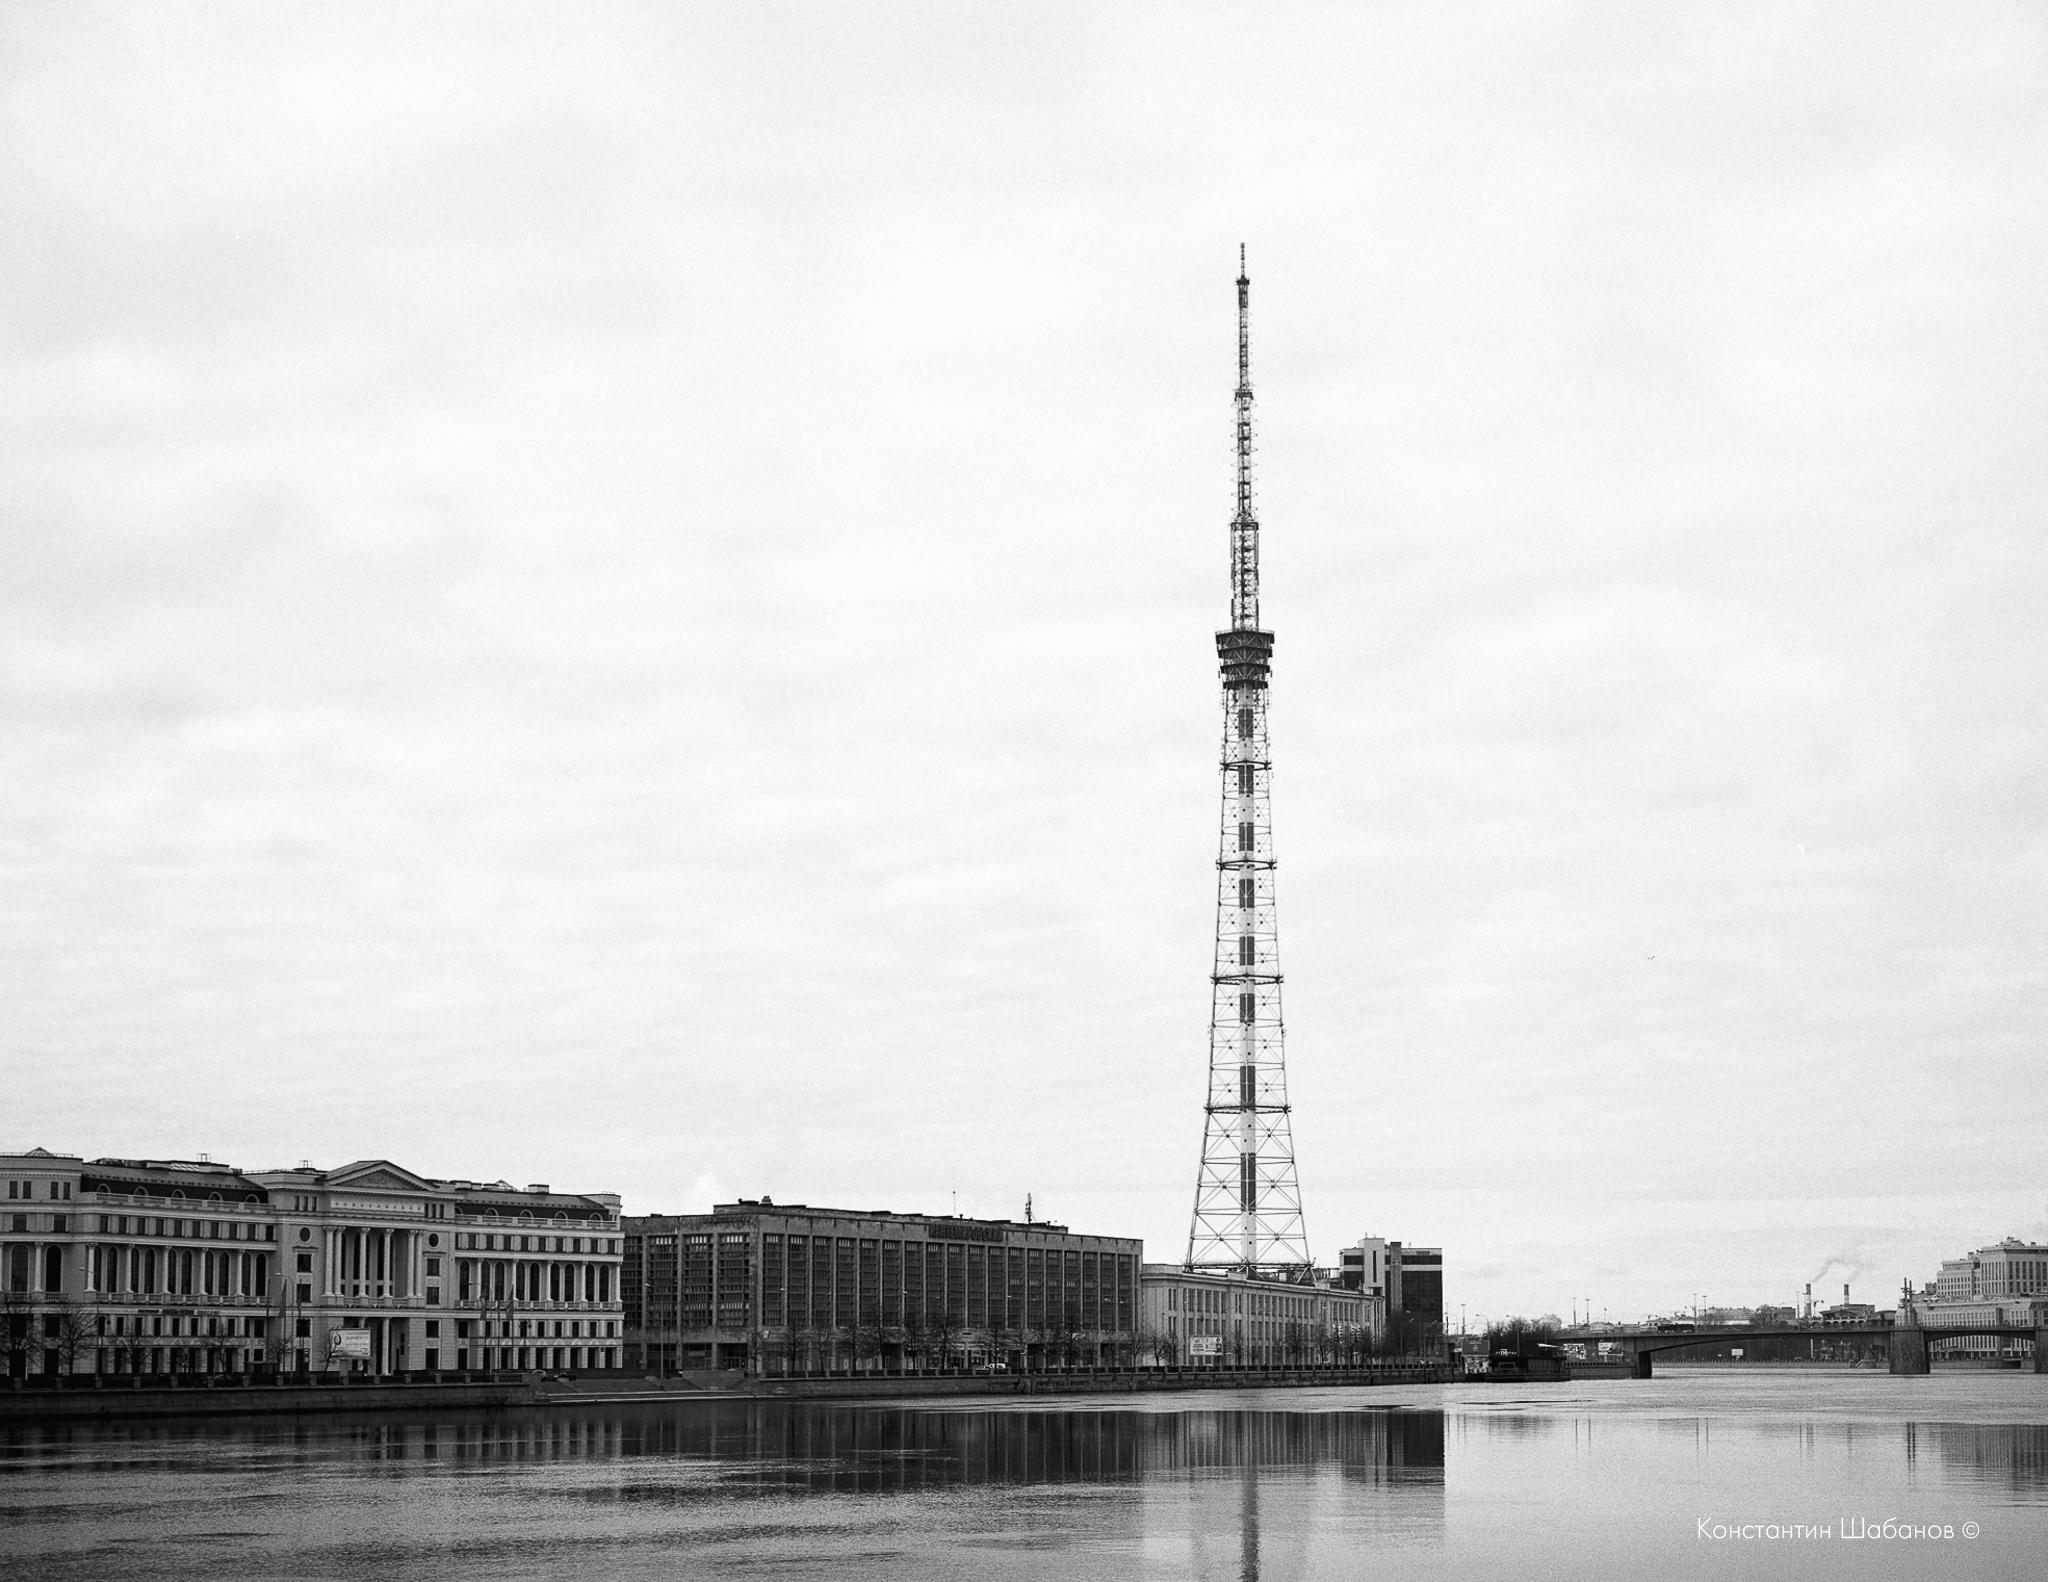 Фотопленка Fujifilm Neopan Acros II 100/120 B&W